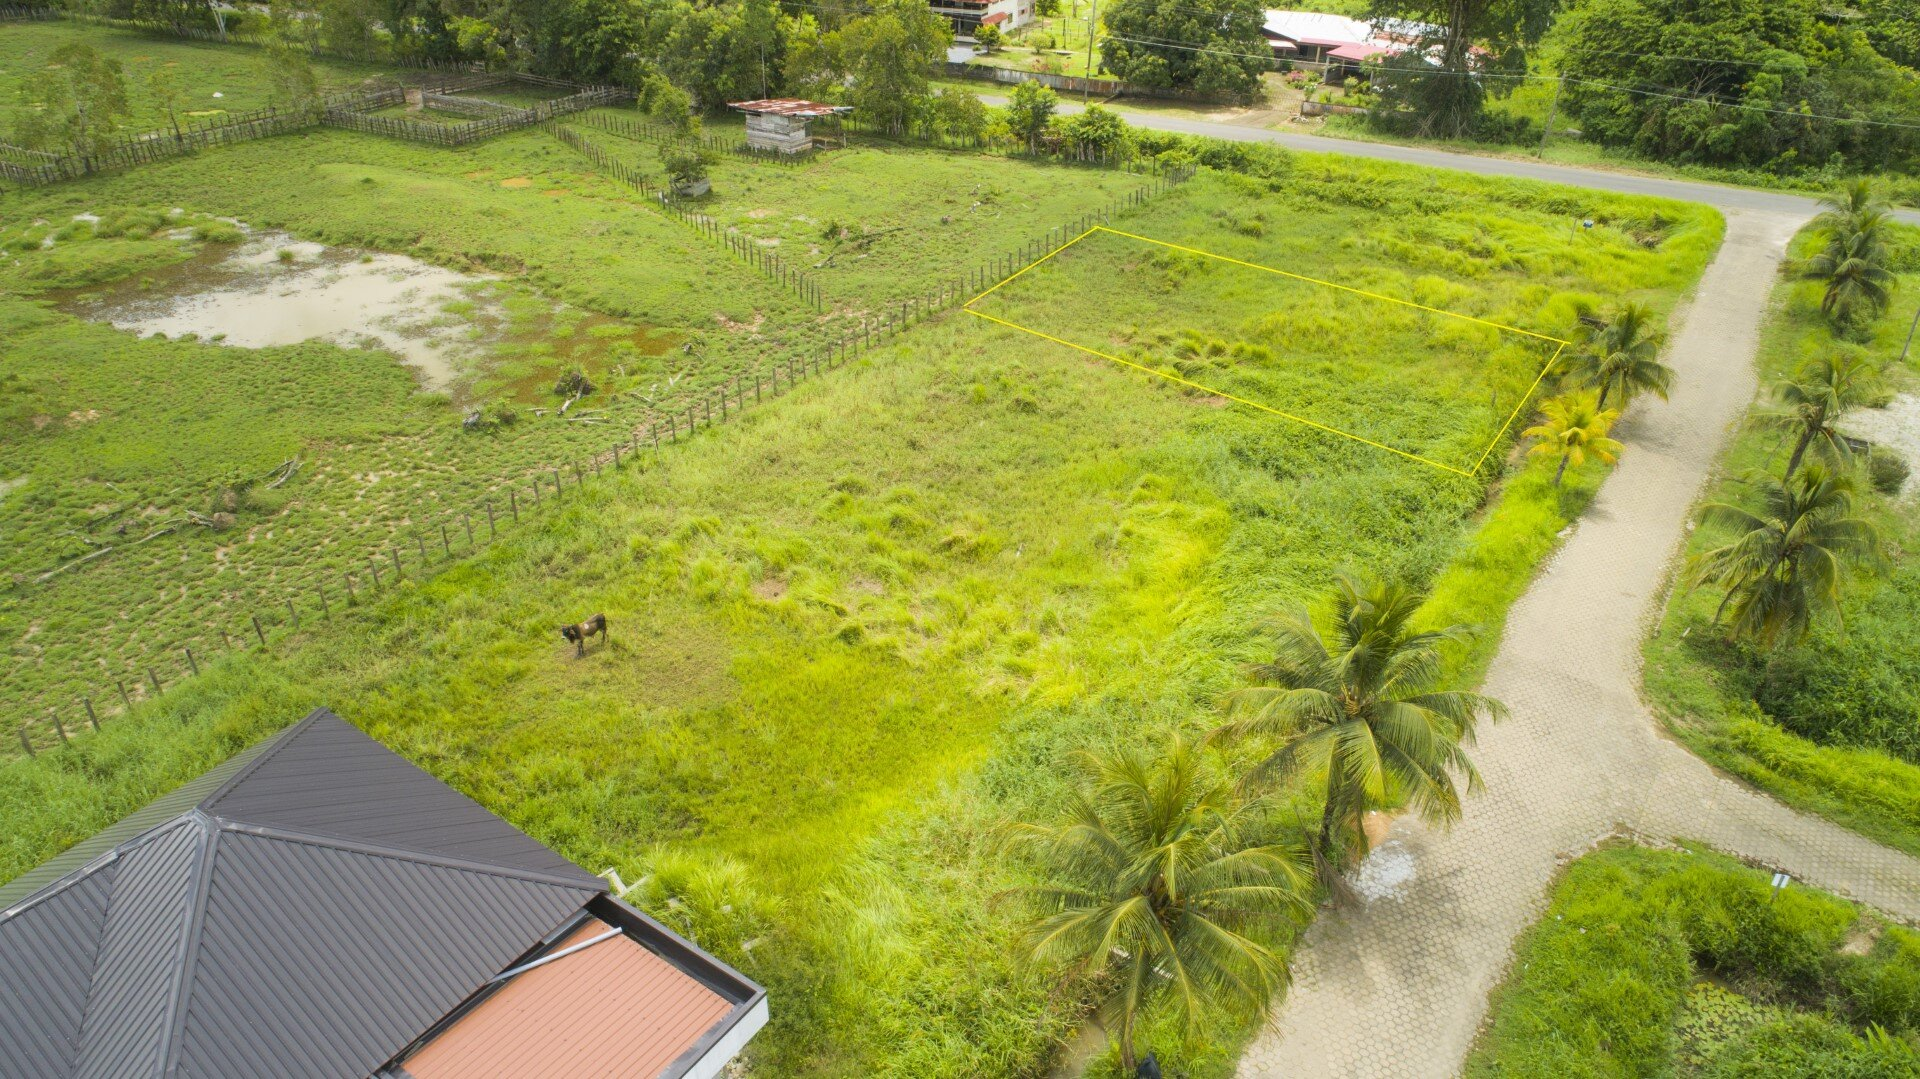 Zonhoop project perceel 95, Tawajari - Perceel te Zonhoop project - Surgoed Makelaardij NV - Paramaribo, Suriname